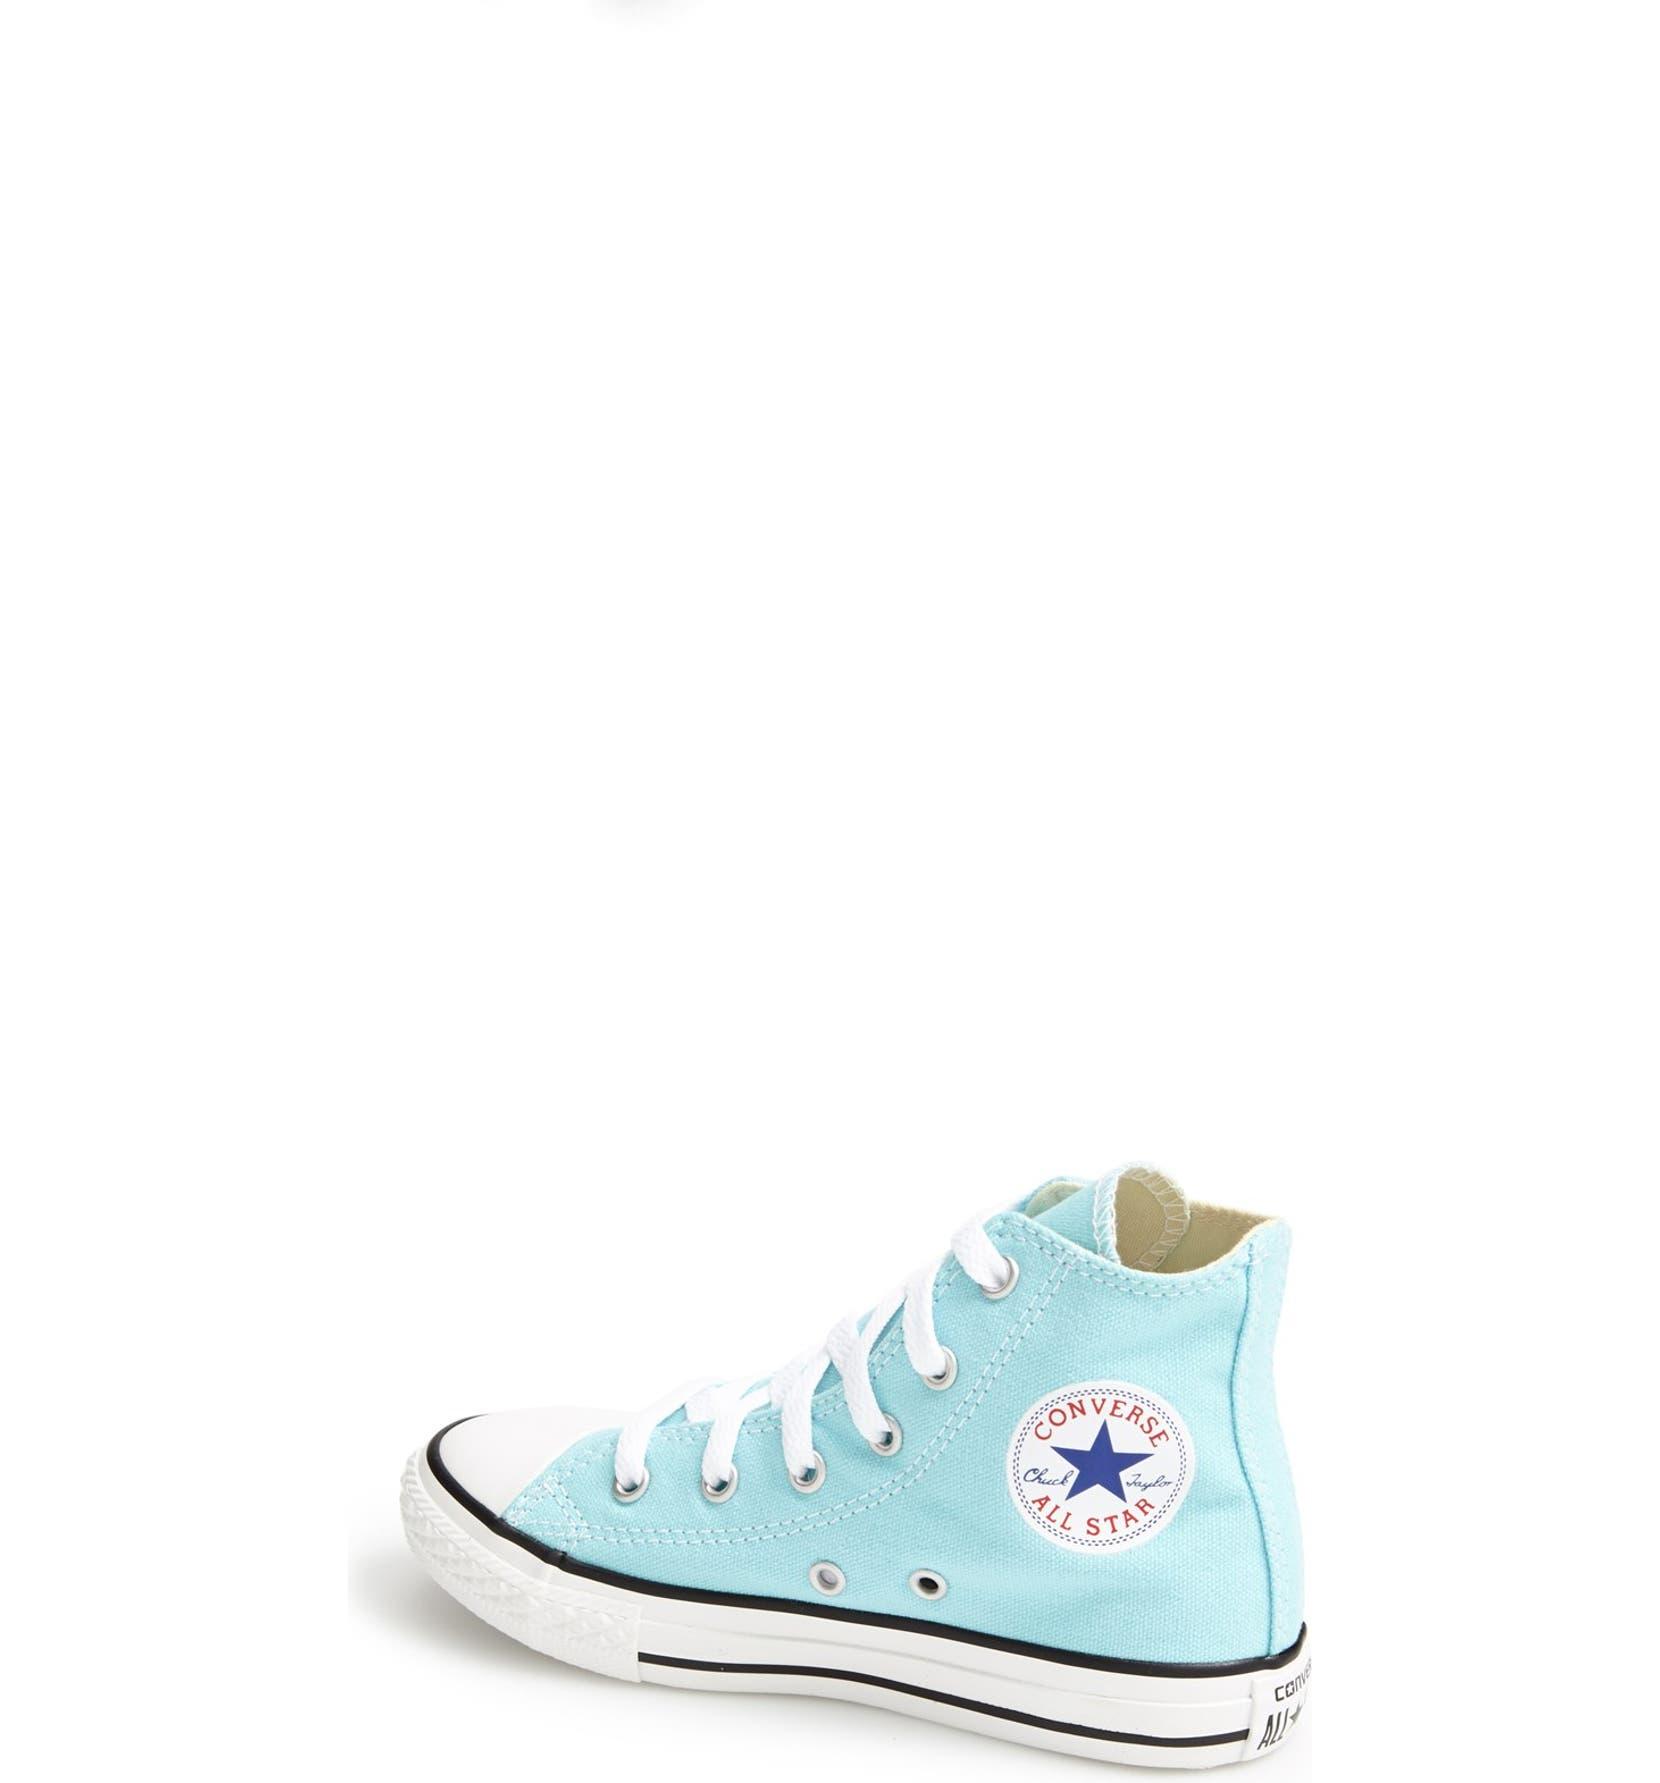 2d6a92c1a45142 Converse Chuck Taylor® All Star®  Sparkle  High Top Sneaker (Toddler ...